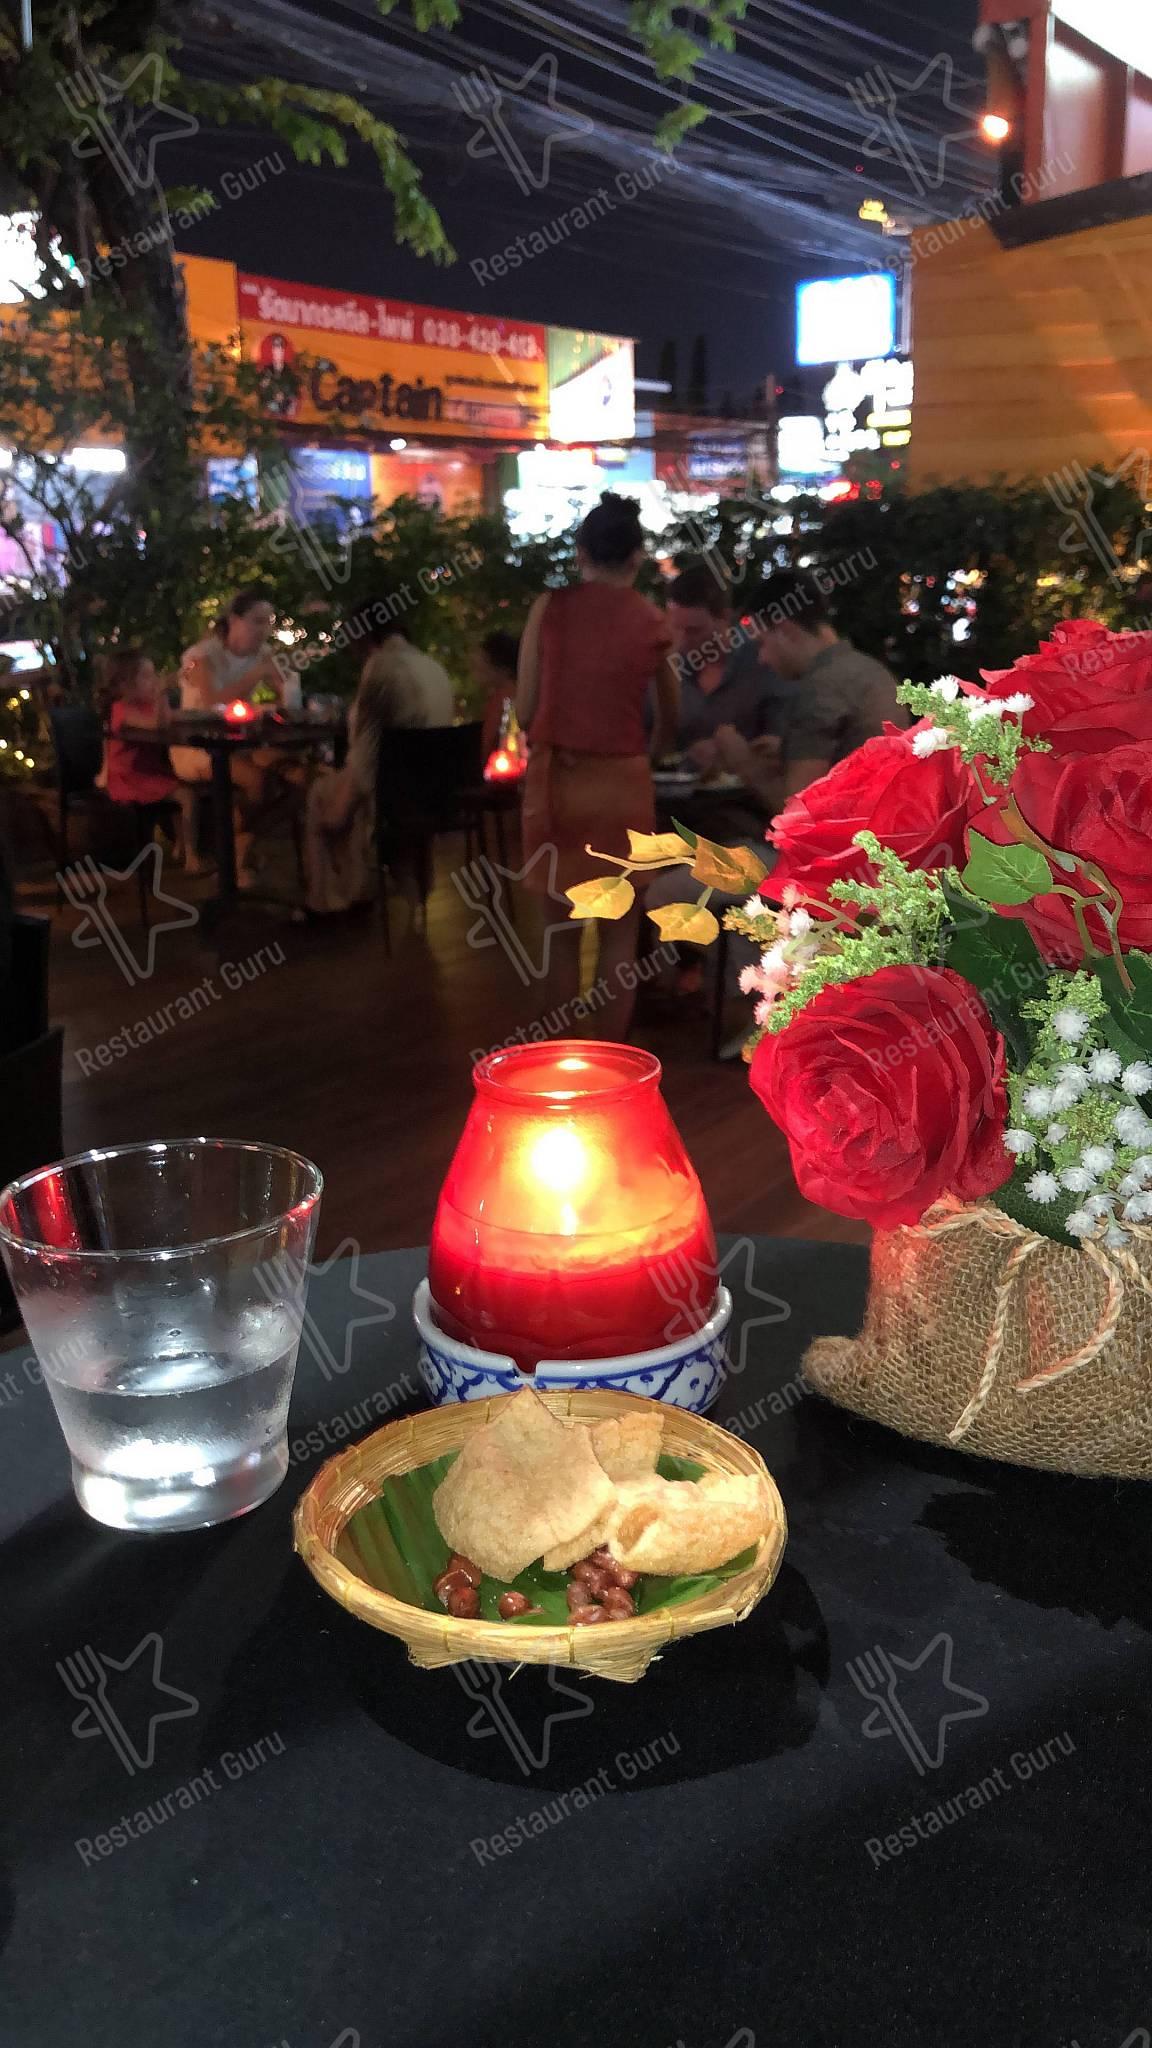 Menu for the Mai Thai Cuisine restaurant